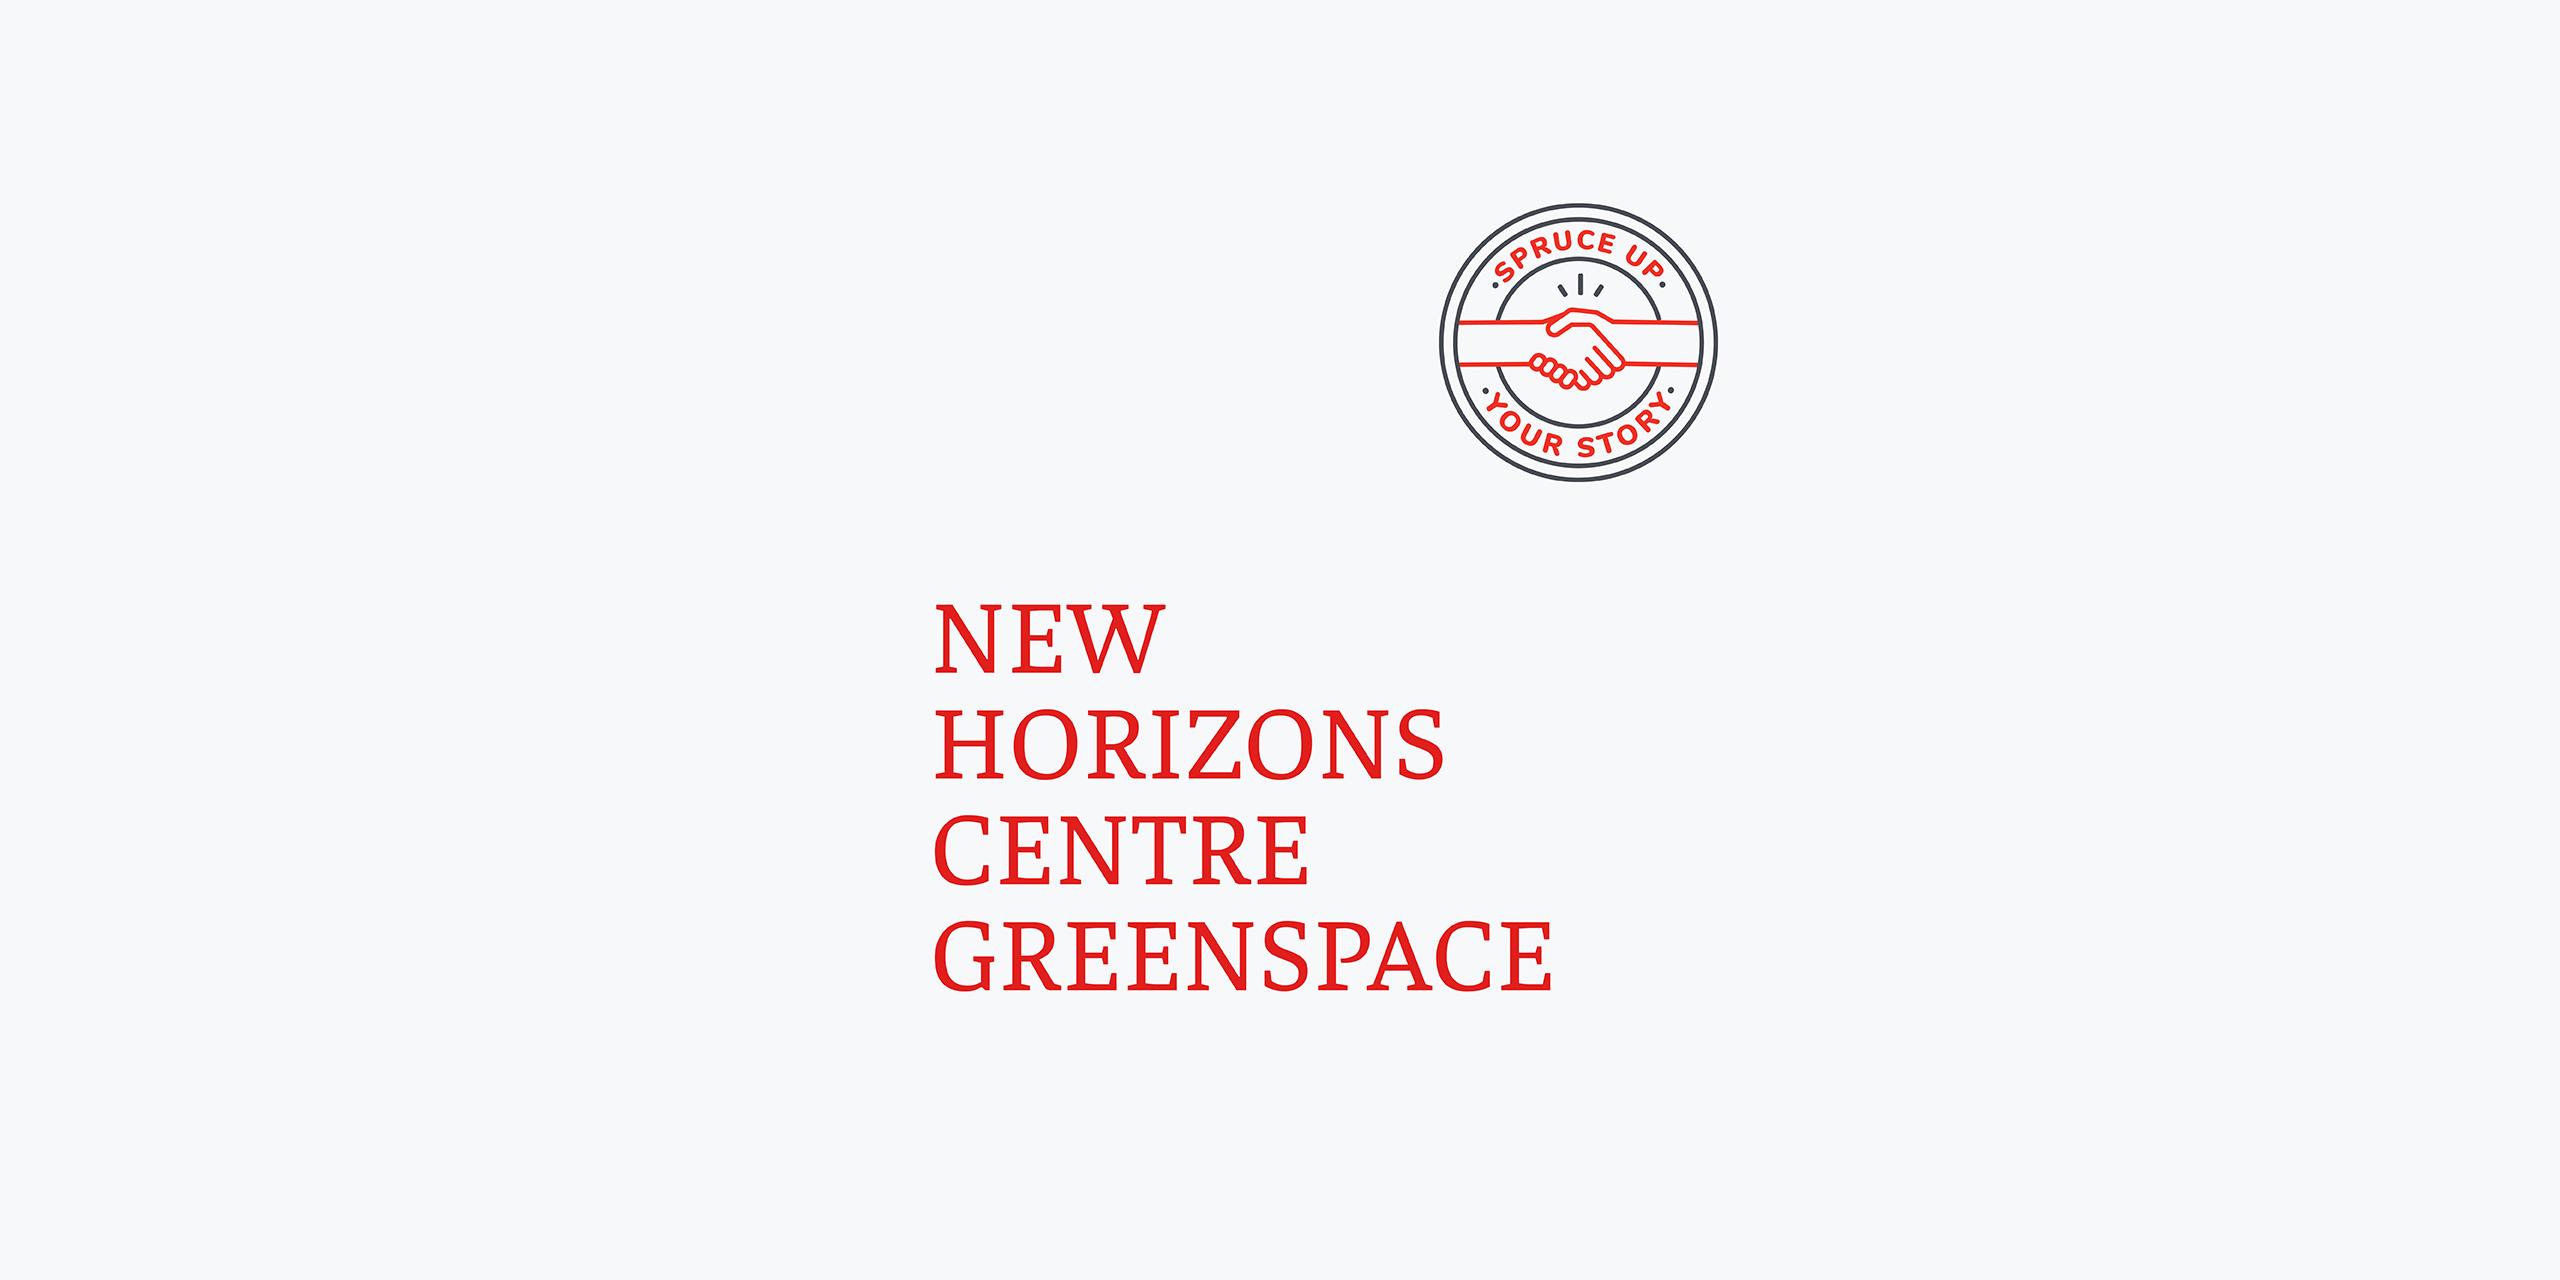 St. Brieux Kin Club's New Horizons Centre Greenspace